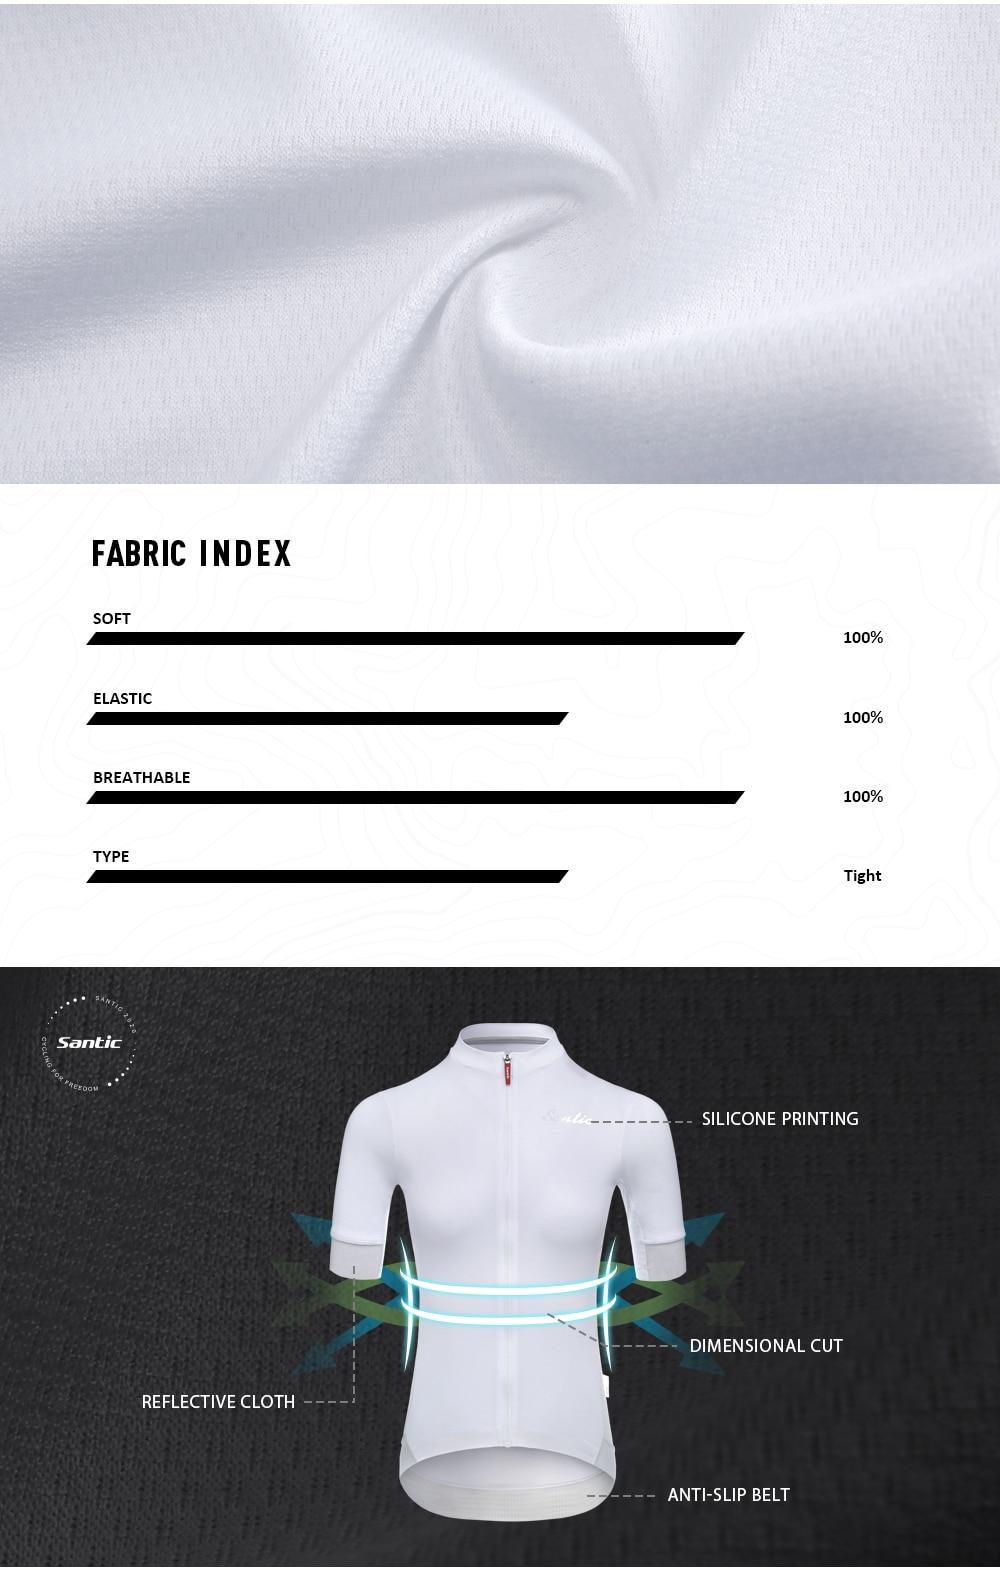 Camisetas p ciclismo